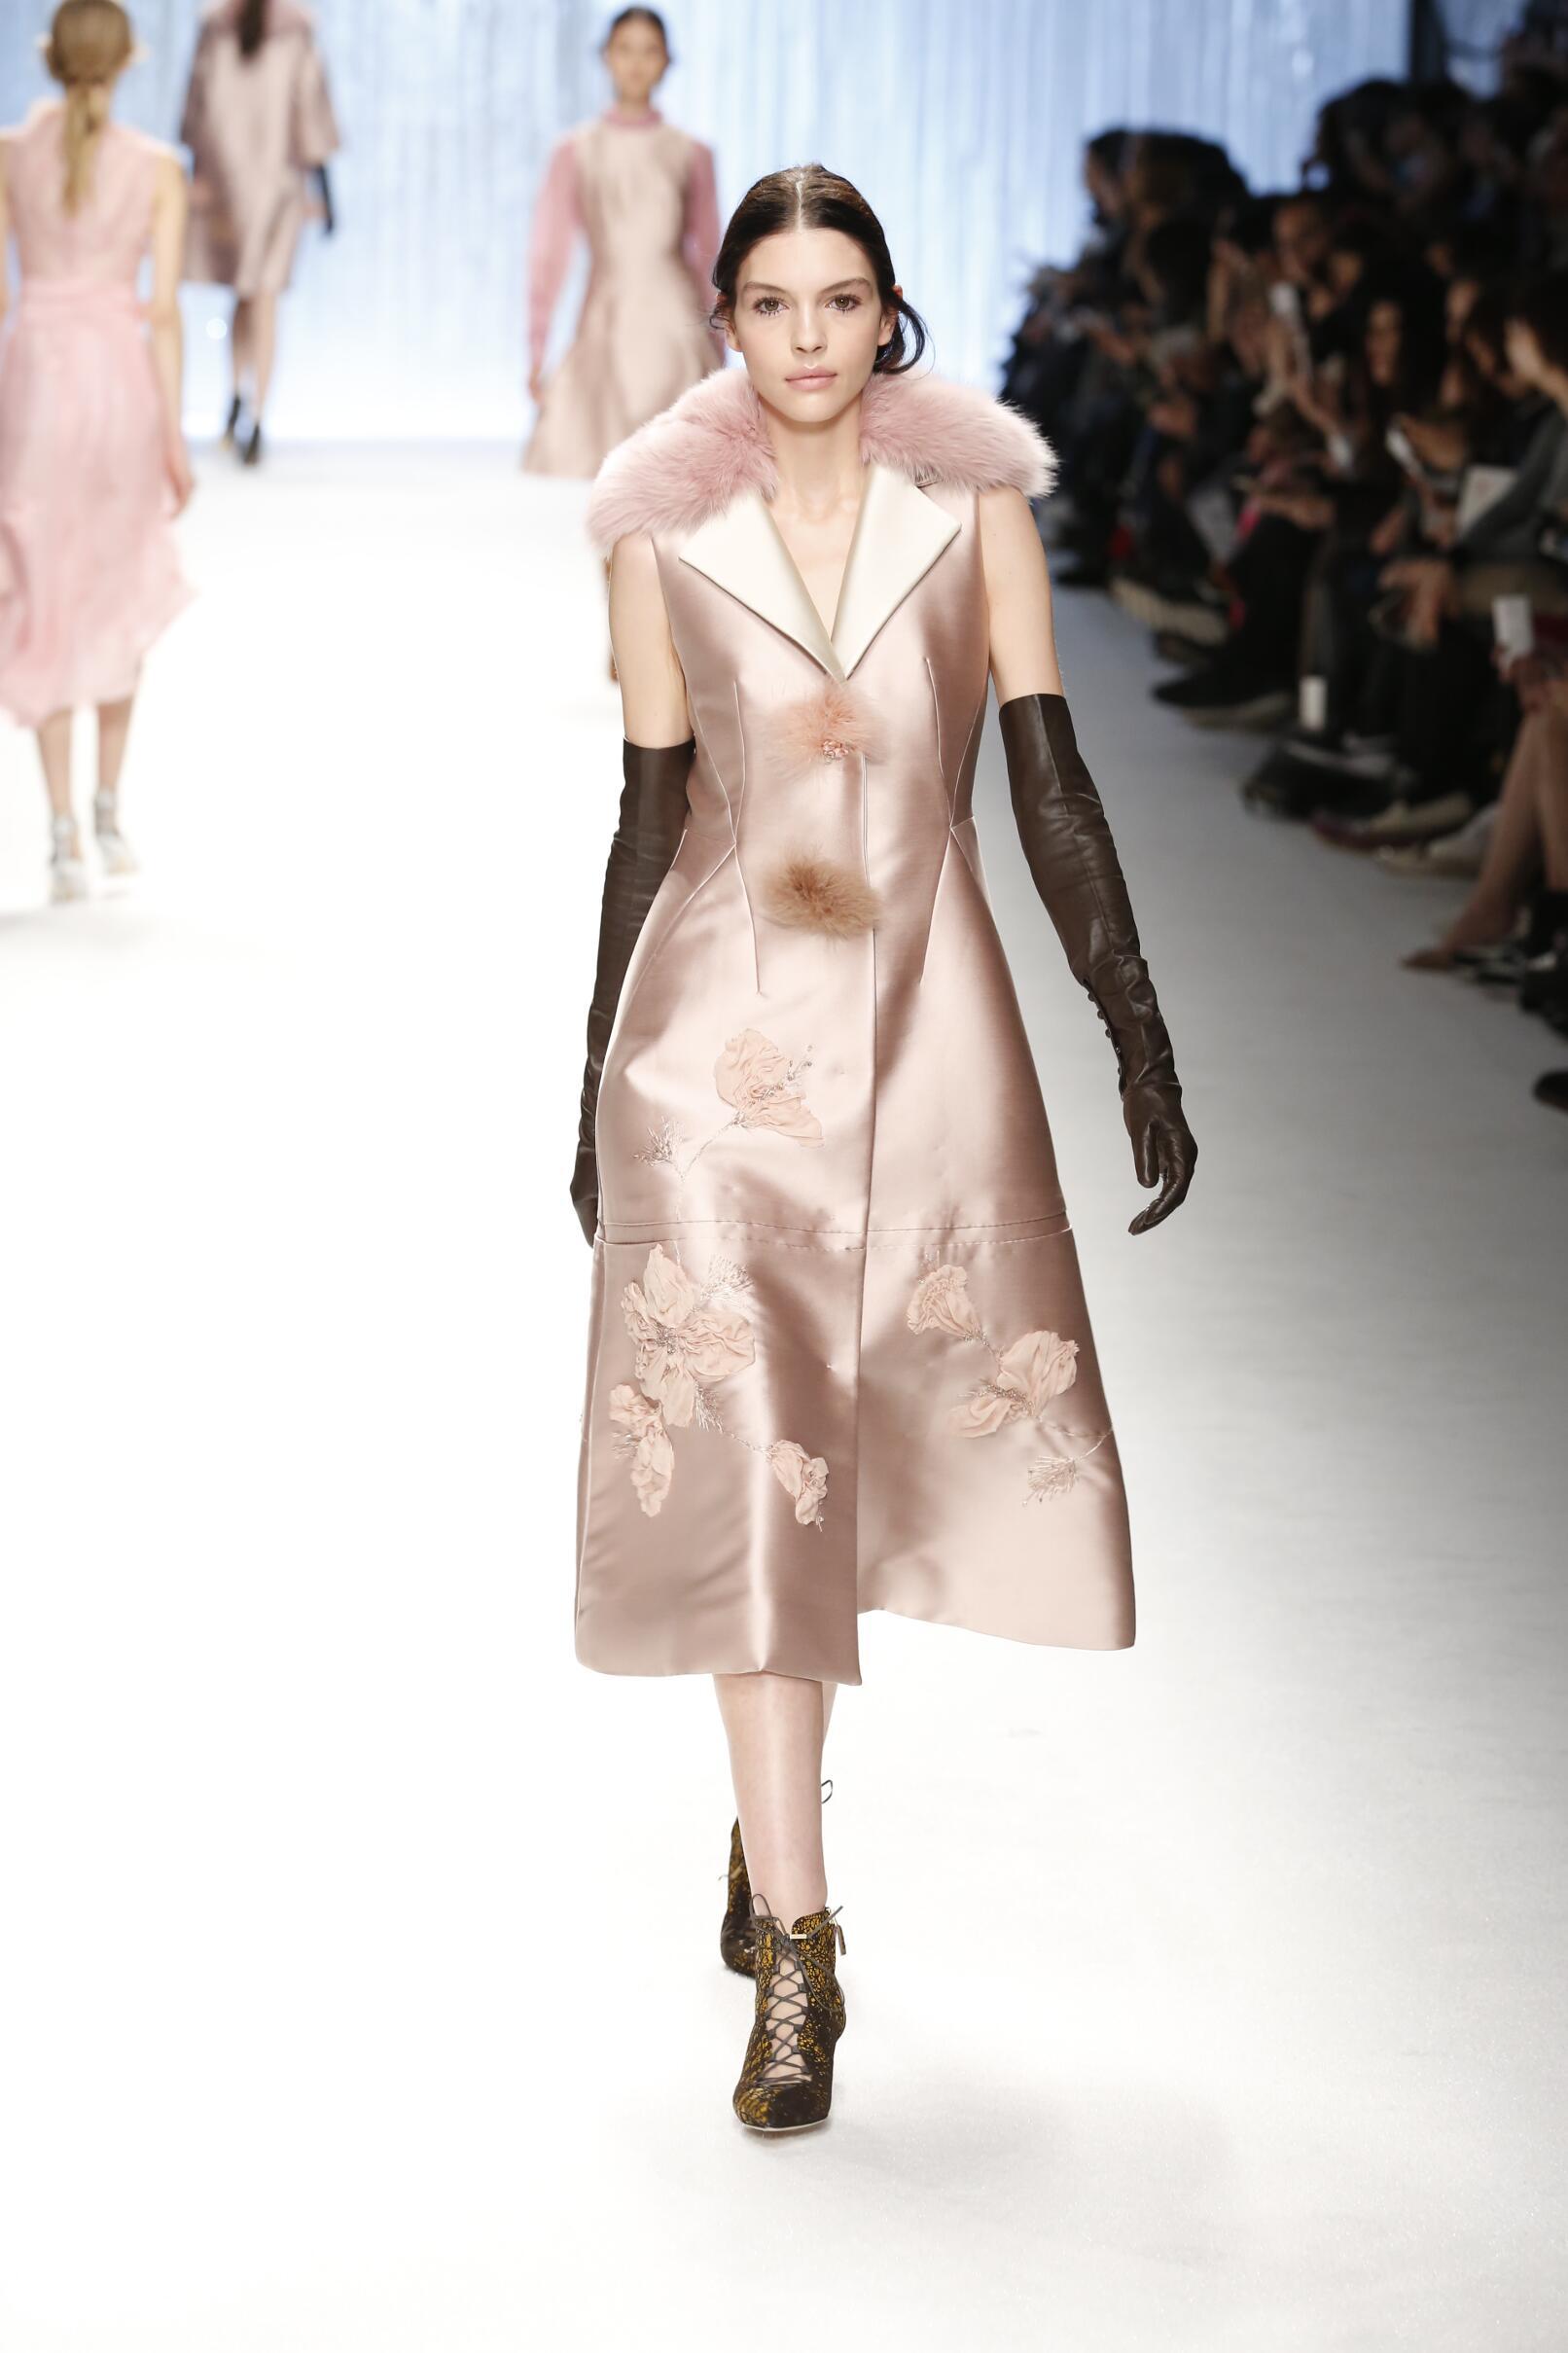 Fashion Women Models Shiatzy Chen Collection Catwalk